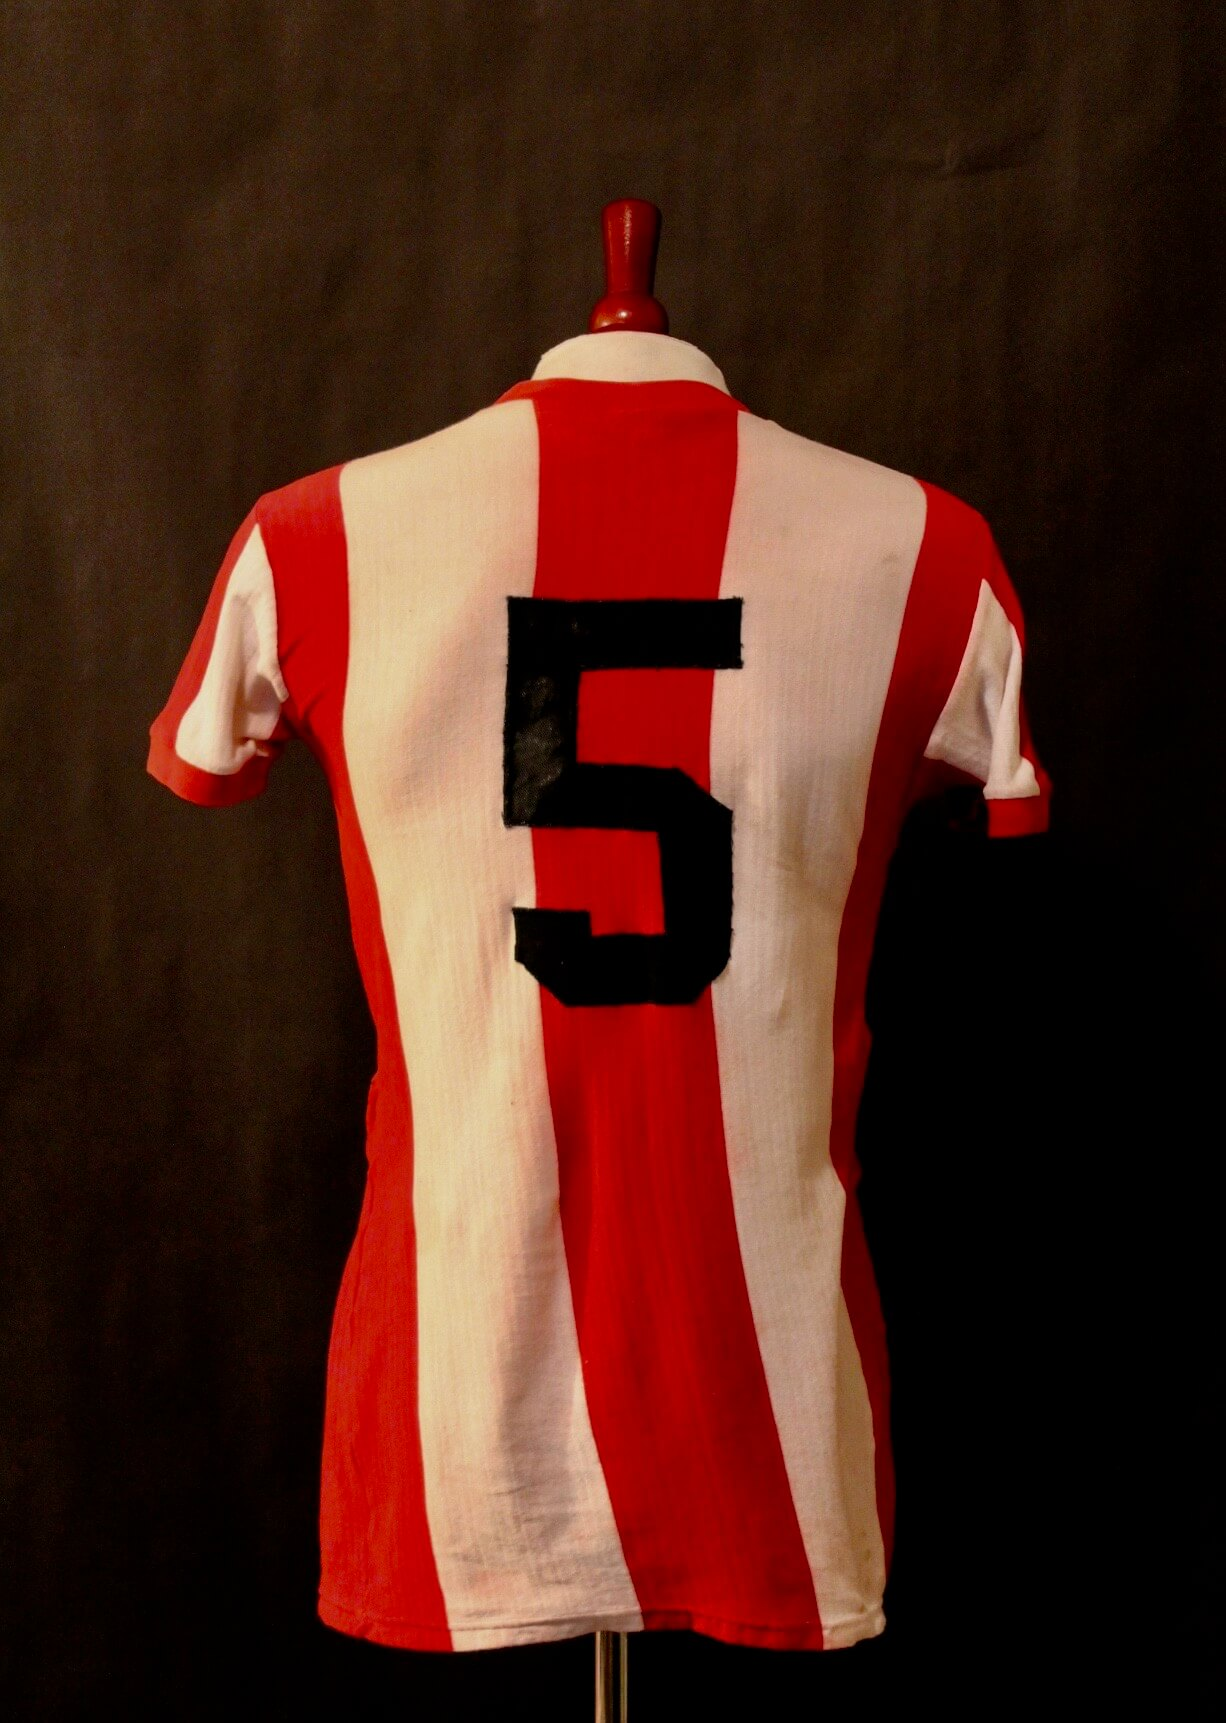 low priced 82f5f 82724 Franz Beckenbauer Game-Used #5 FC Bayern Munich Shirt & Original  Olympiastadion Seat. Circa 1968-1972.